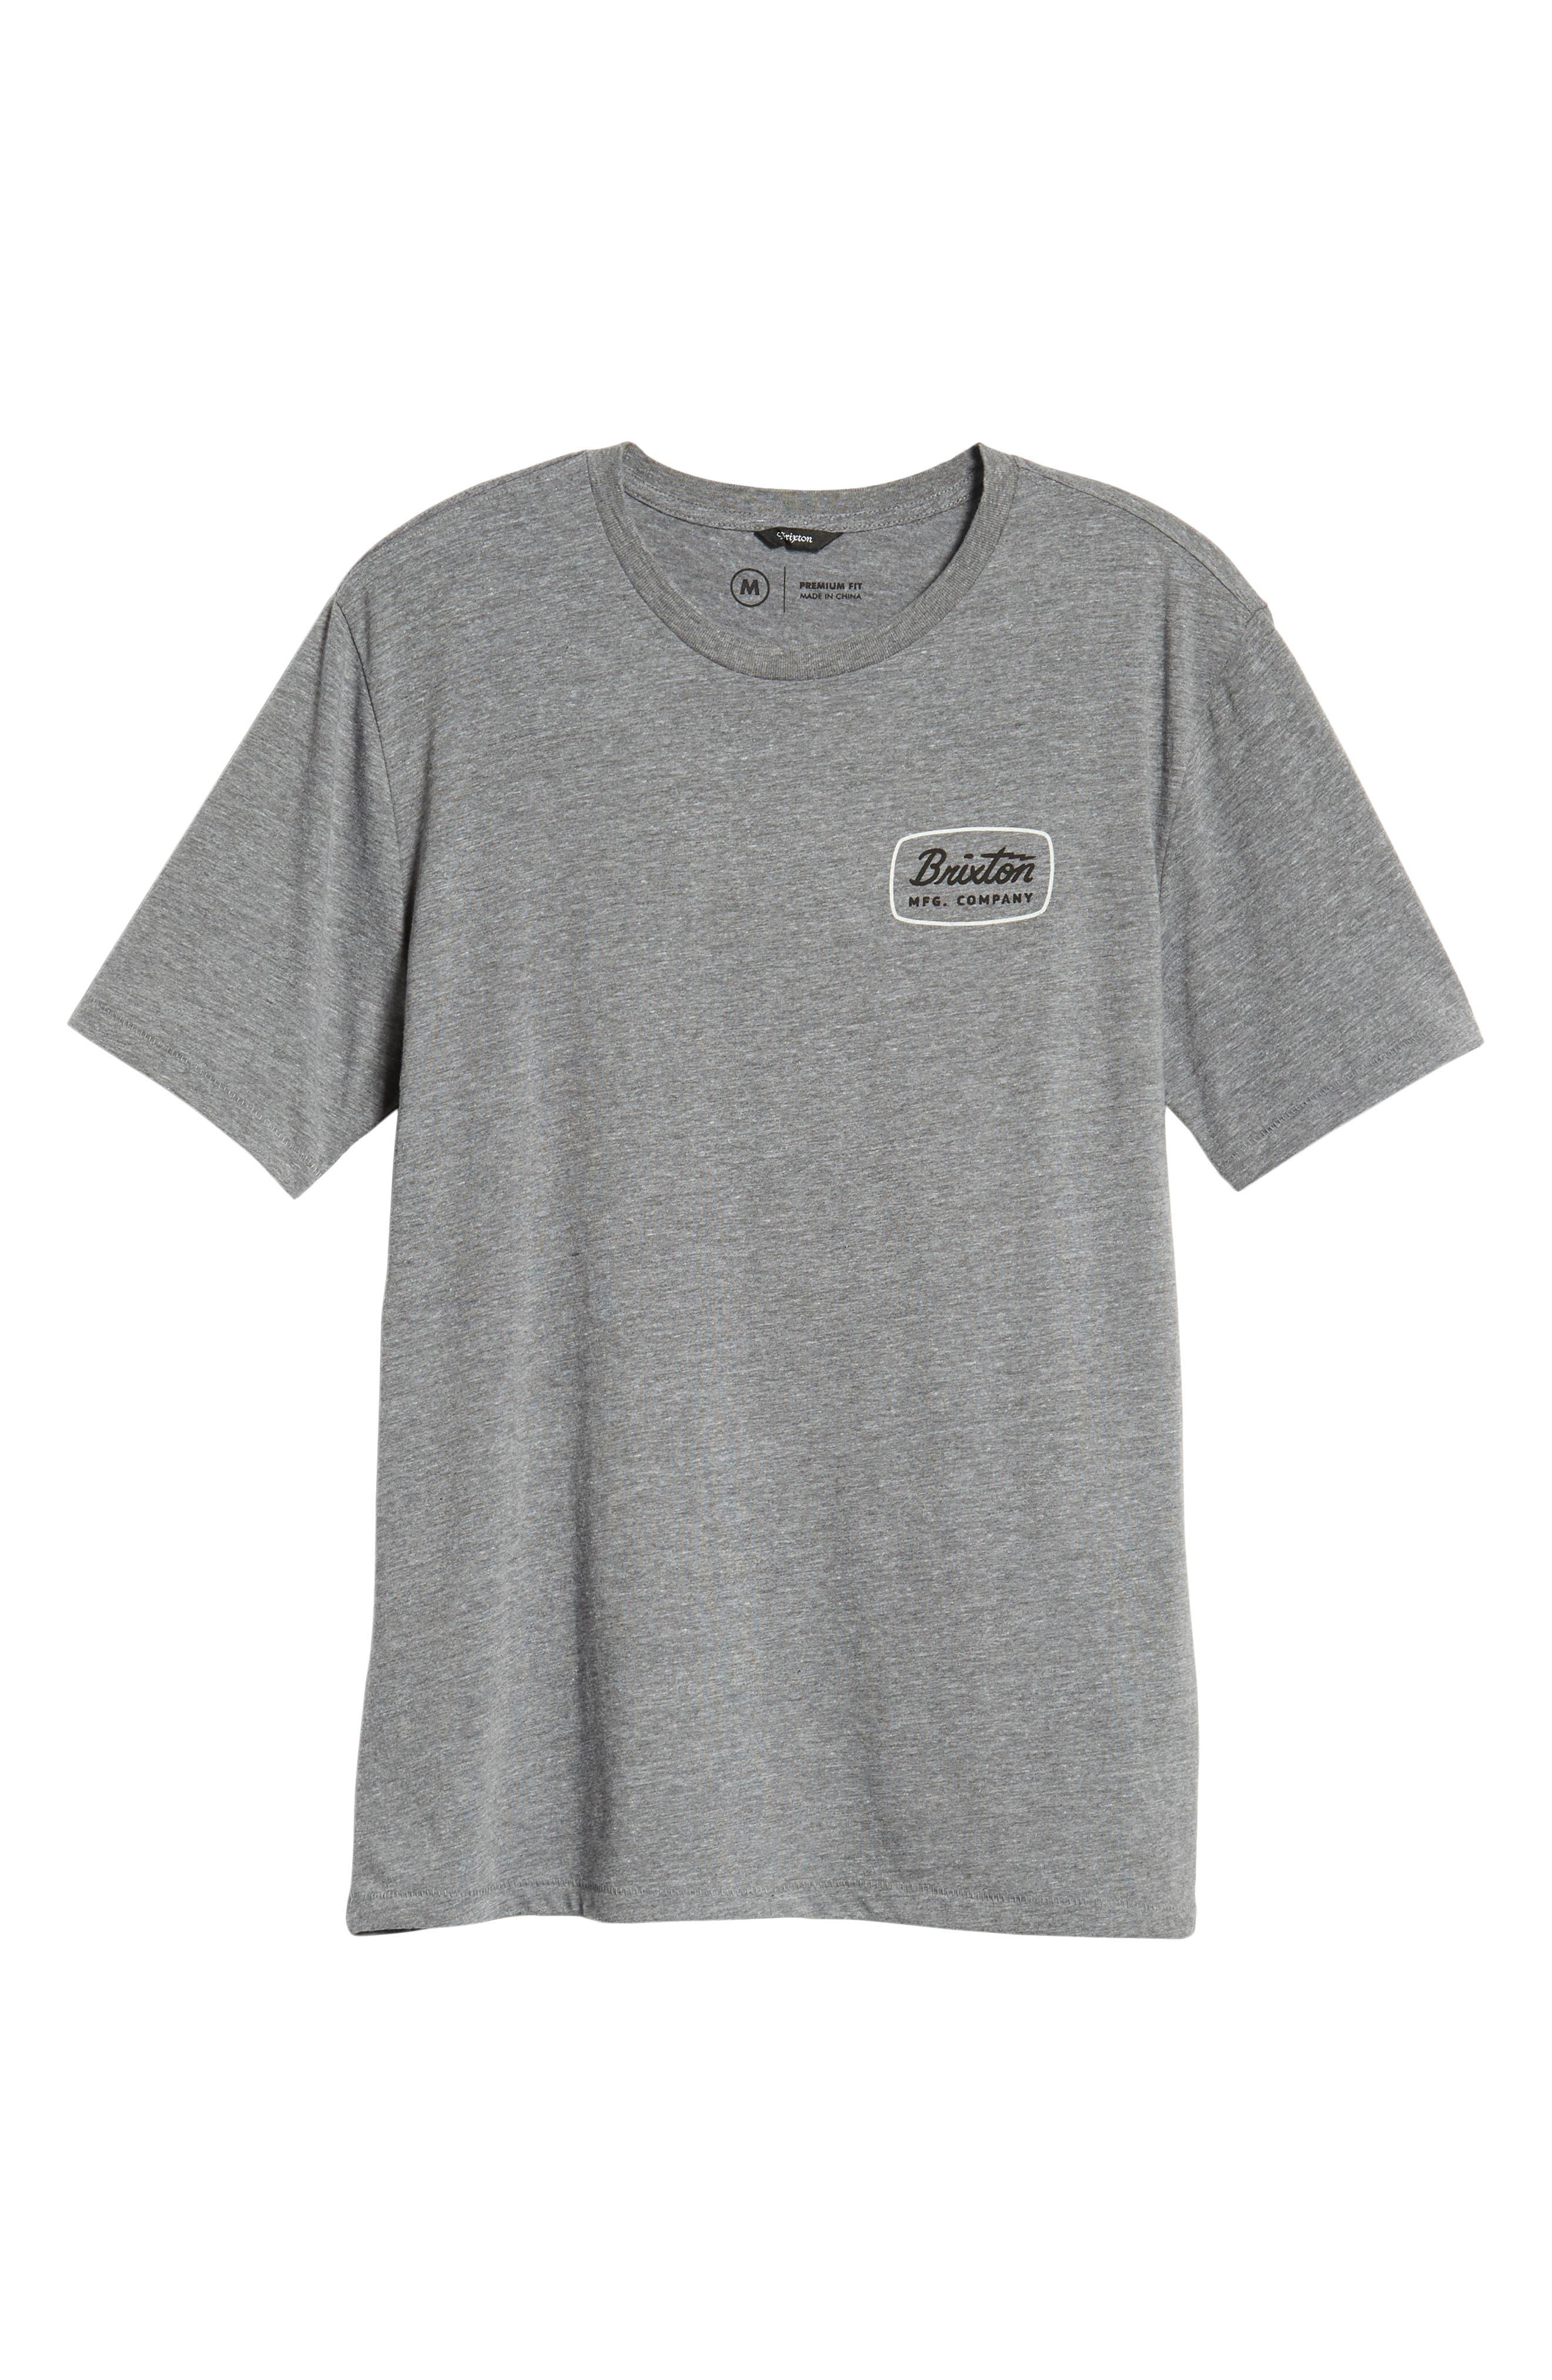 Jolt T-Shirt,                             Alternate thumbnail 6, color,                             HEATHER GREY/ WHITE